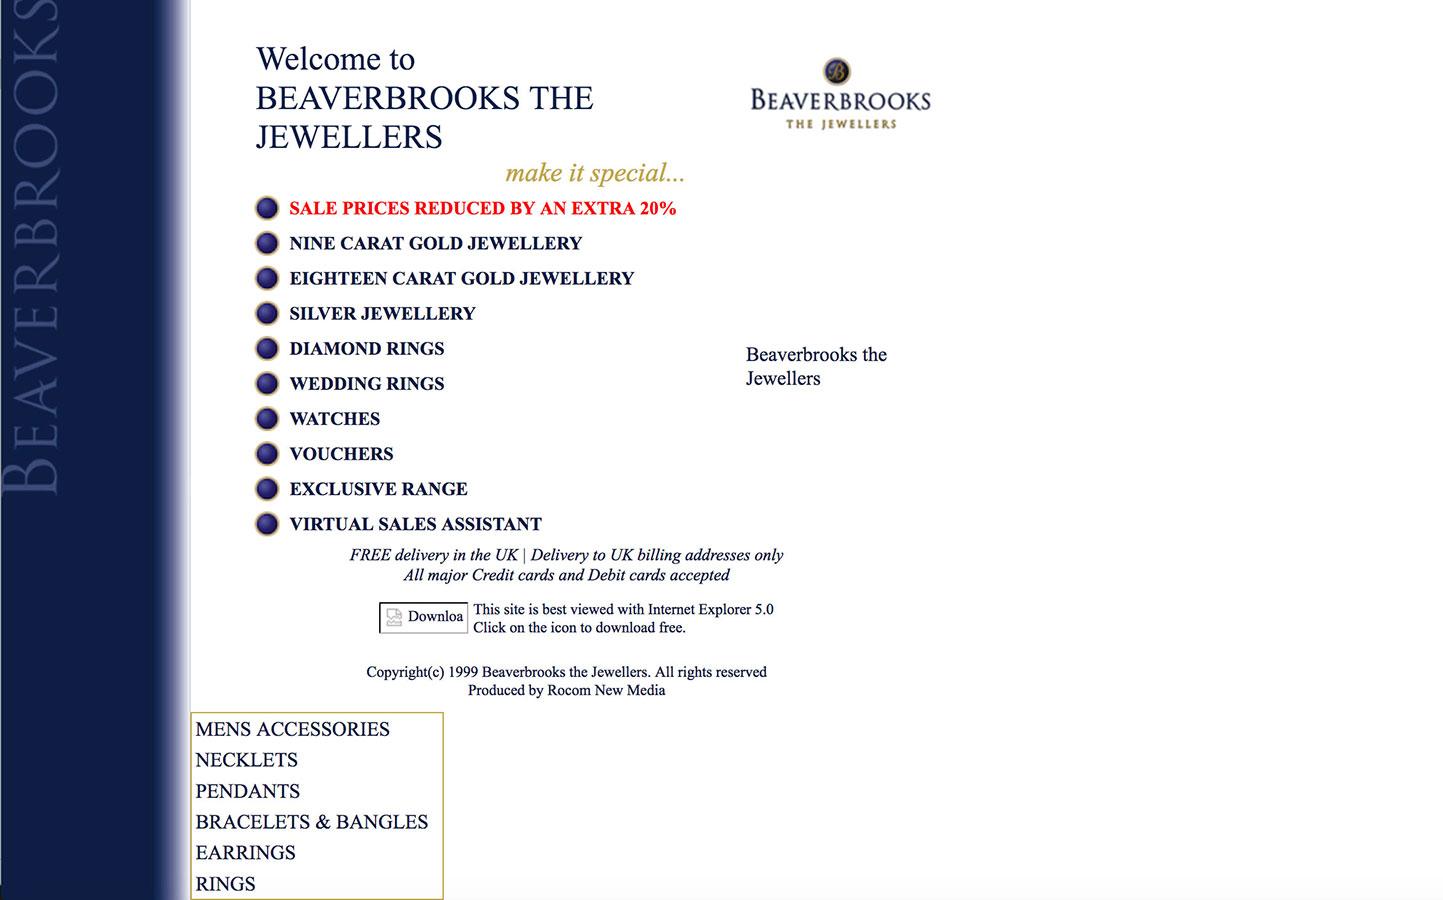 Beaverbrooks Website 2001